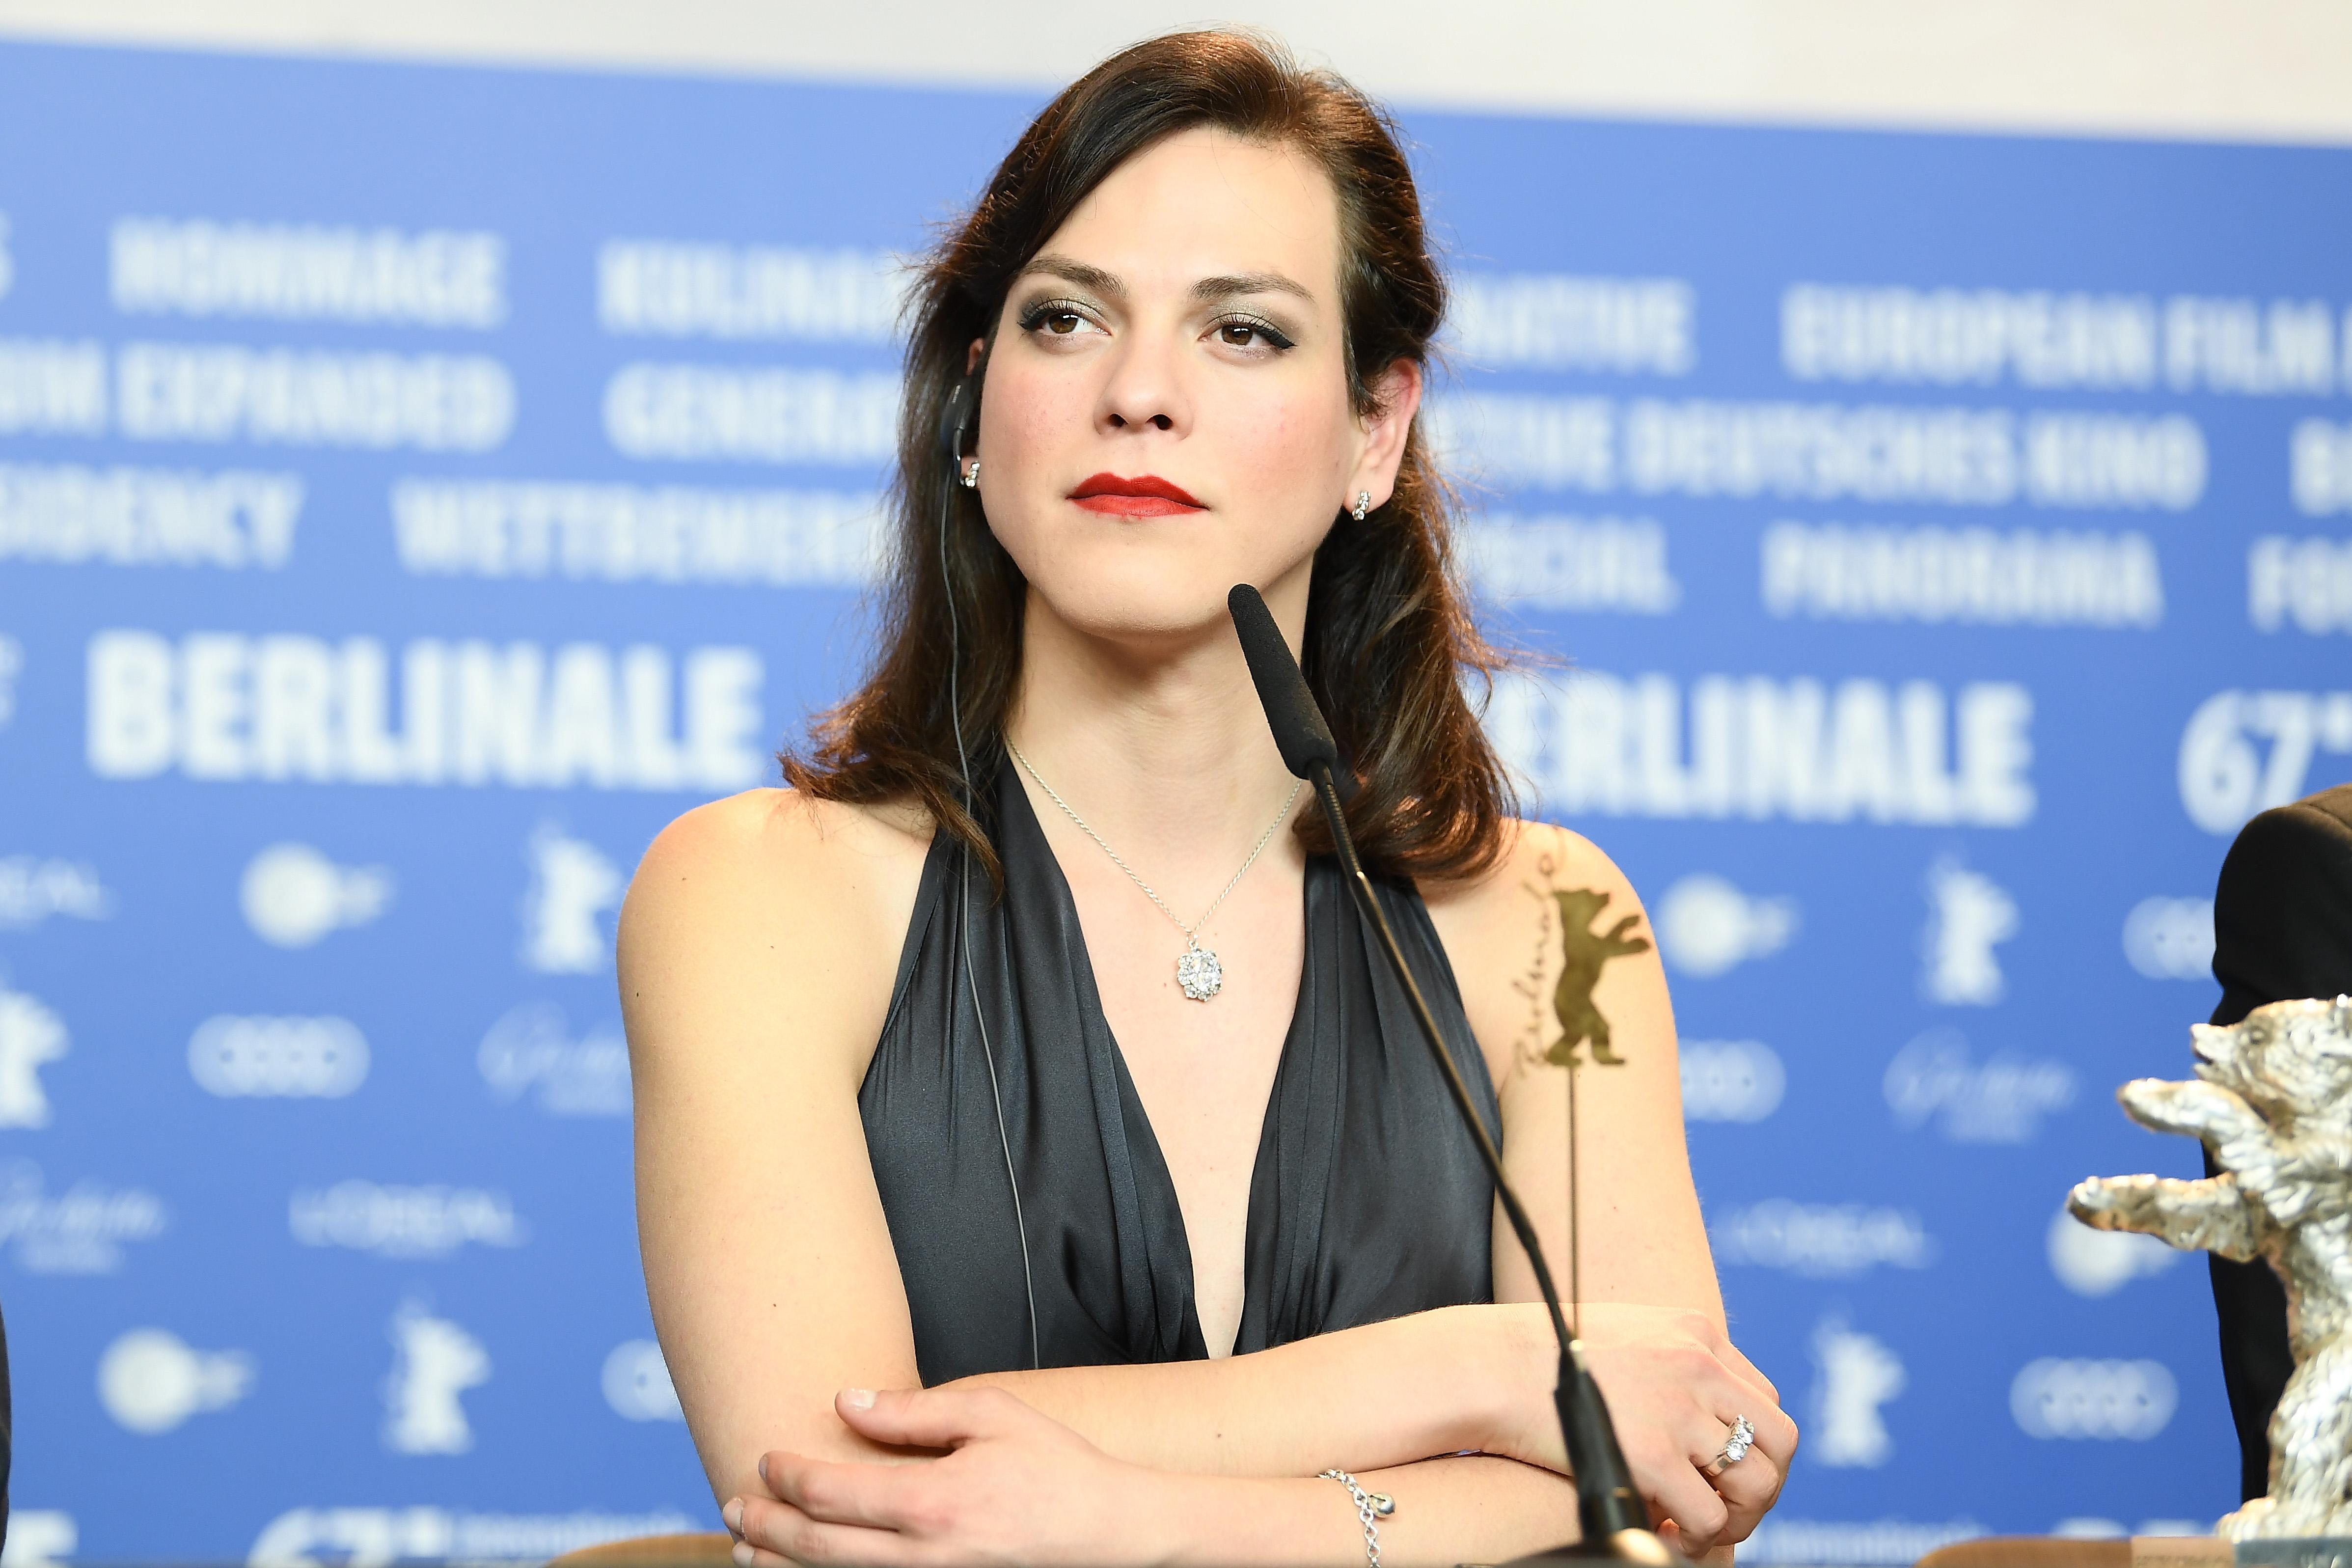 Transgender Actress Daniela Vega to Make History By Presenting at the Oscars